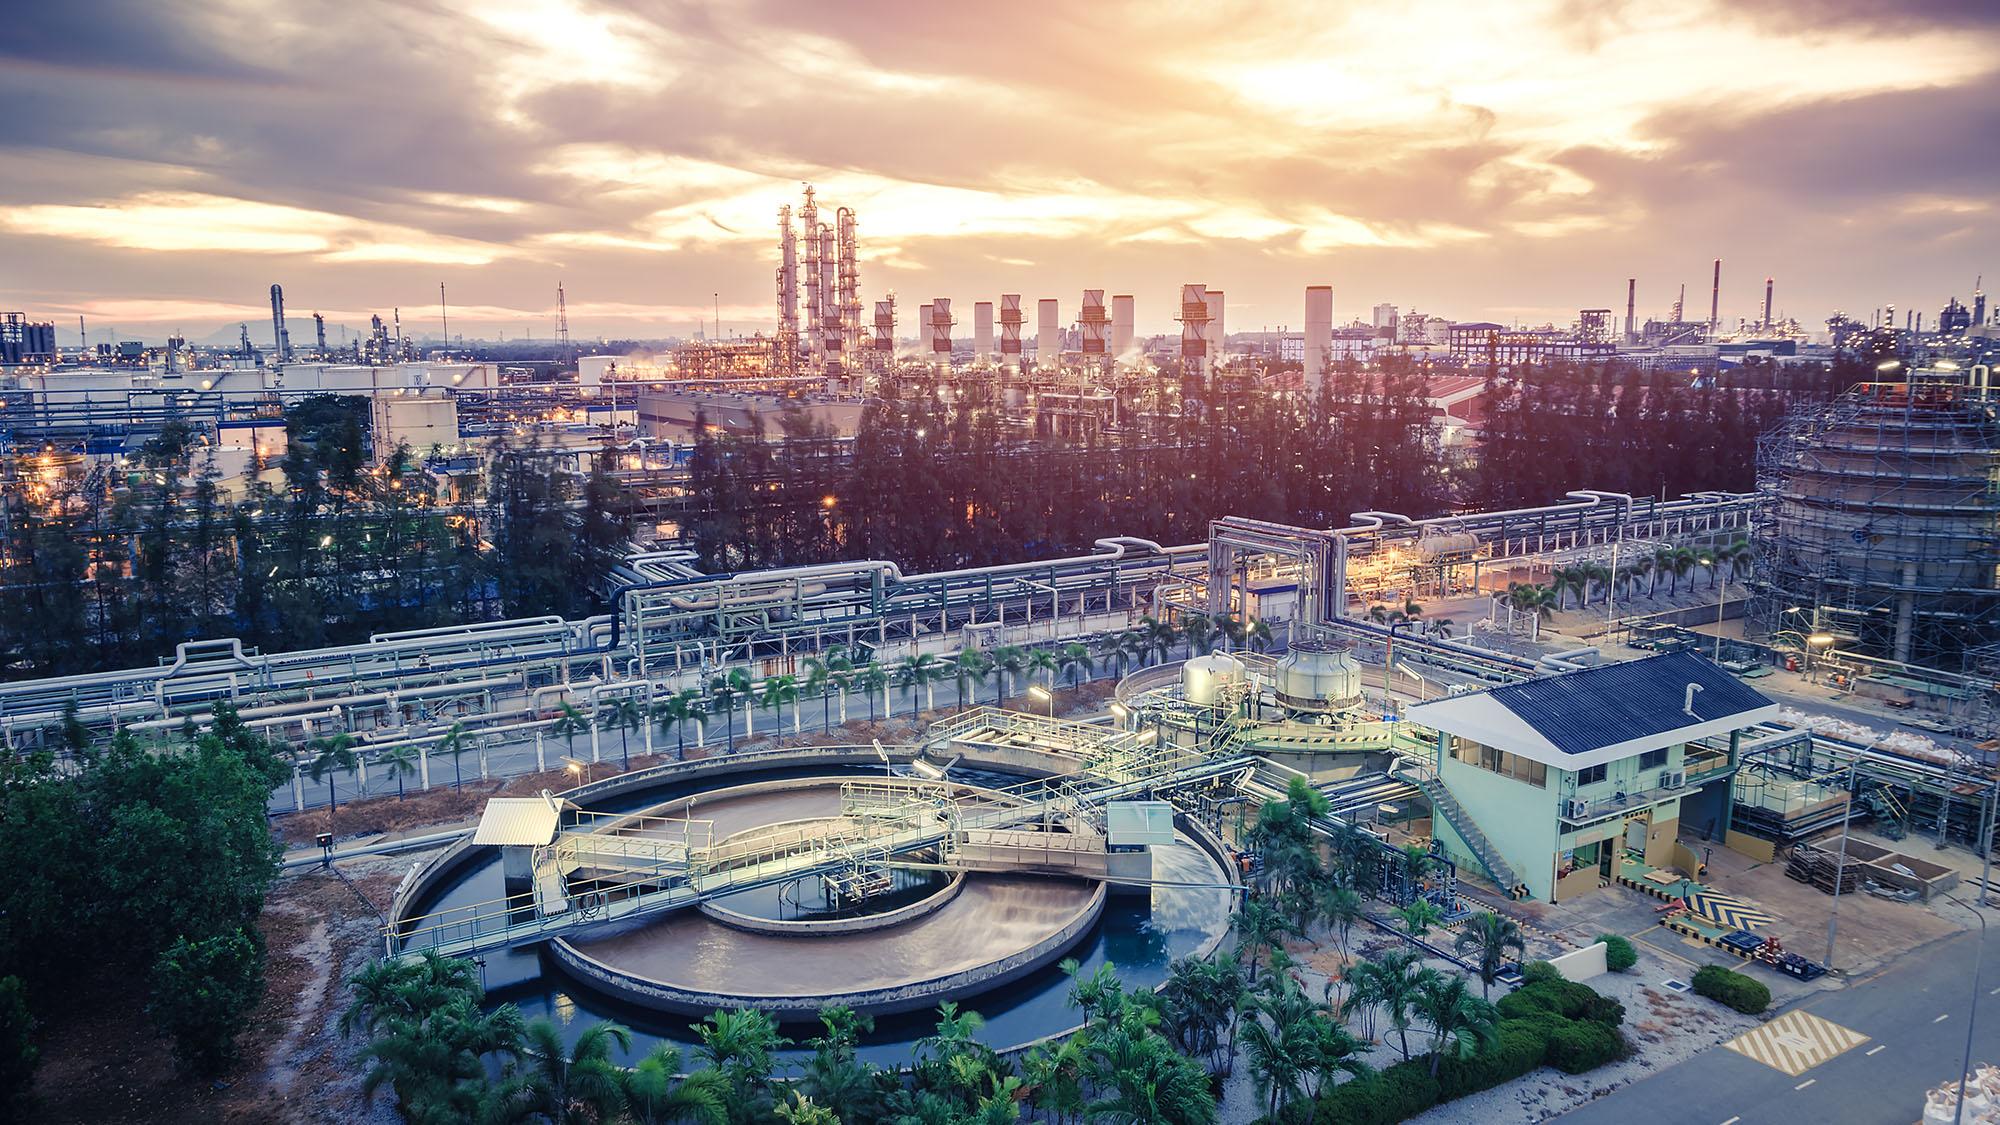 Petrochemical industrial estate